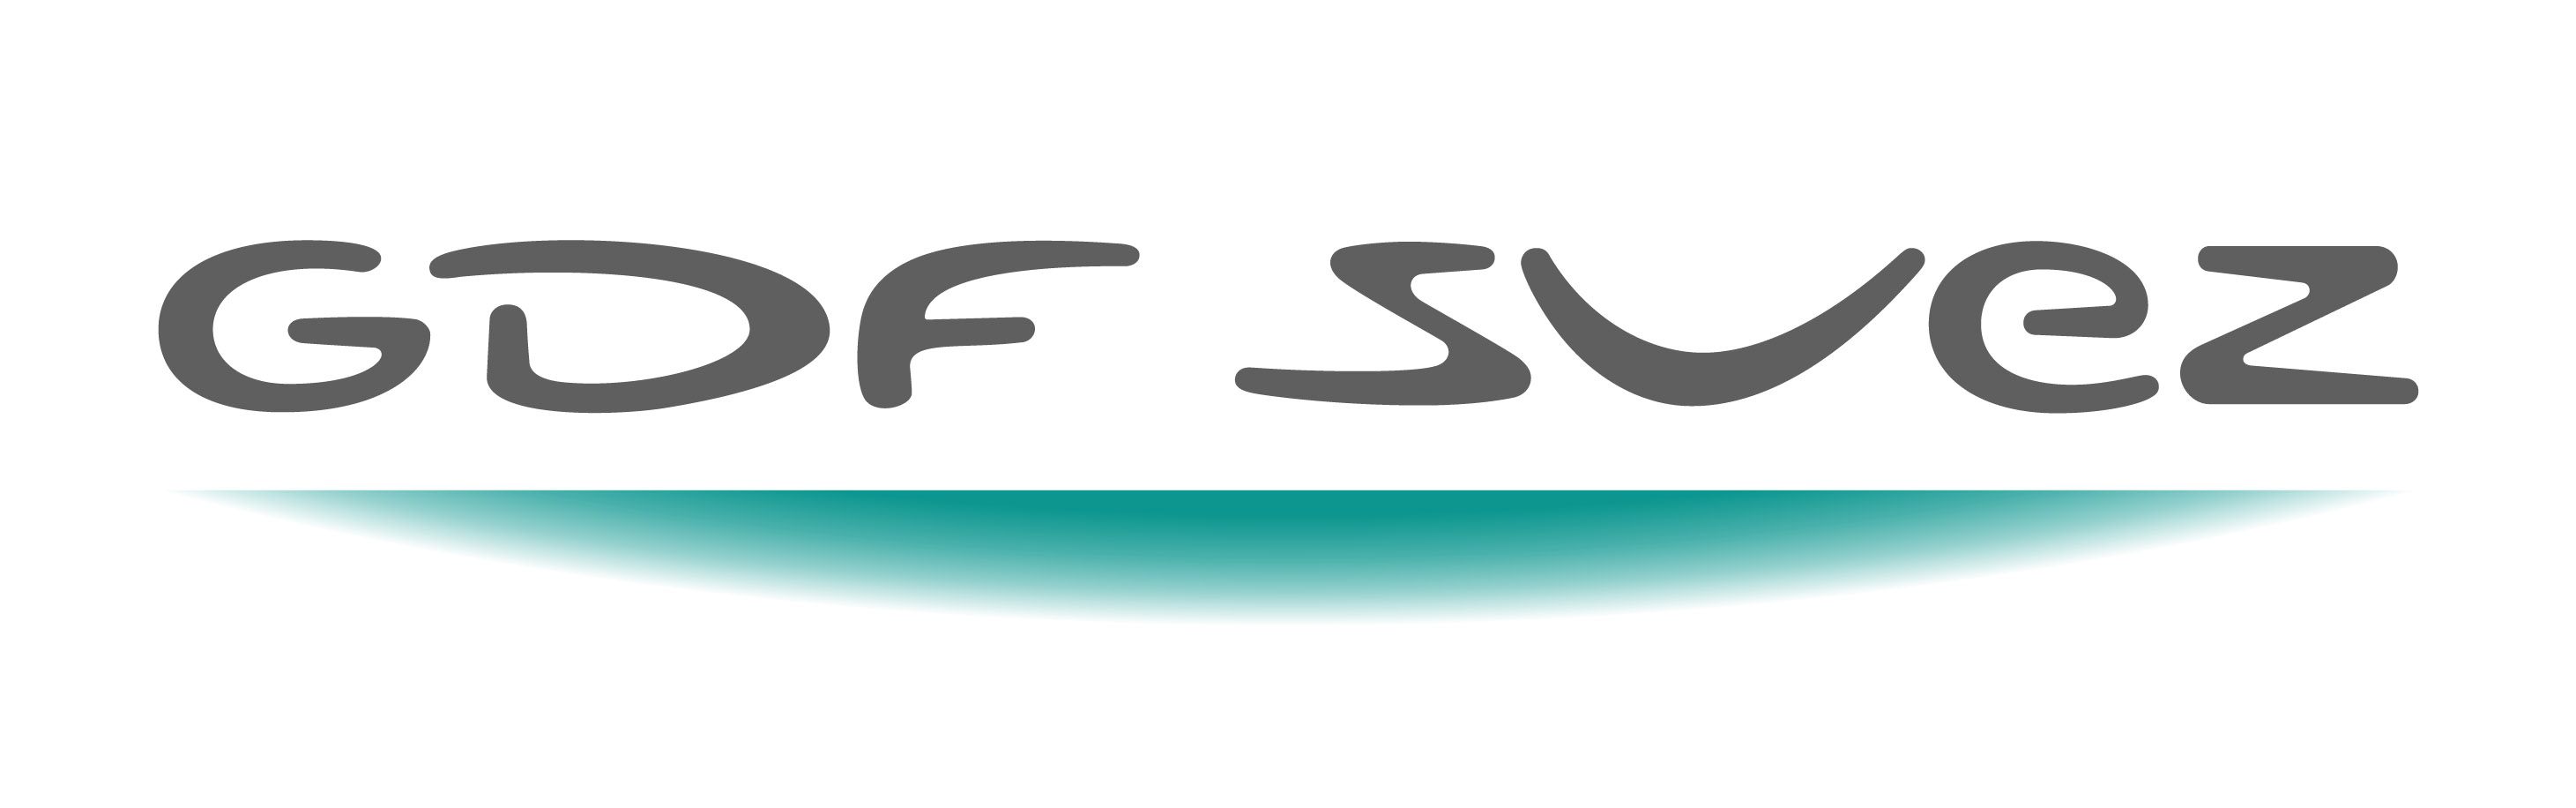 Ene Field 187 Partner Gdf Suez